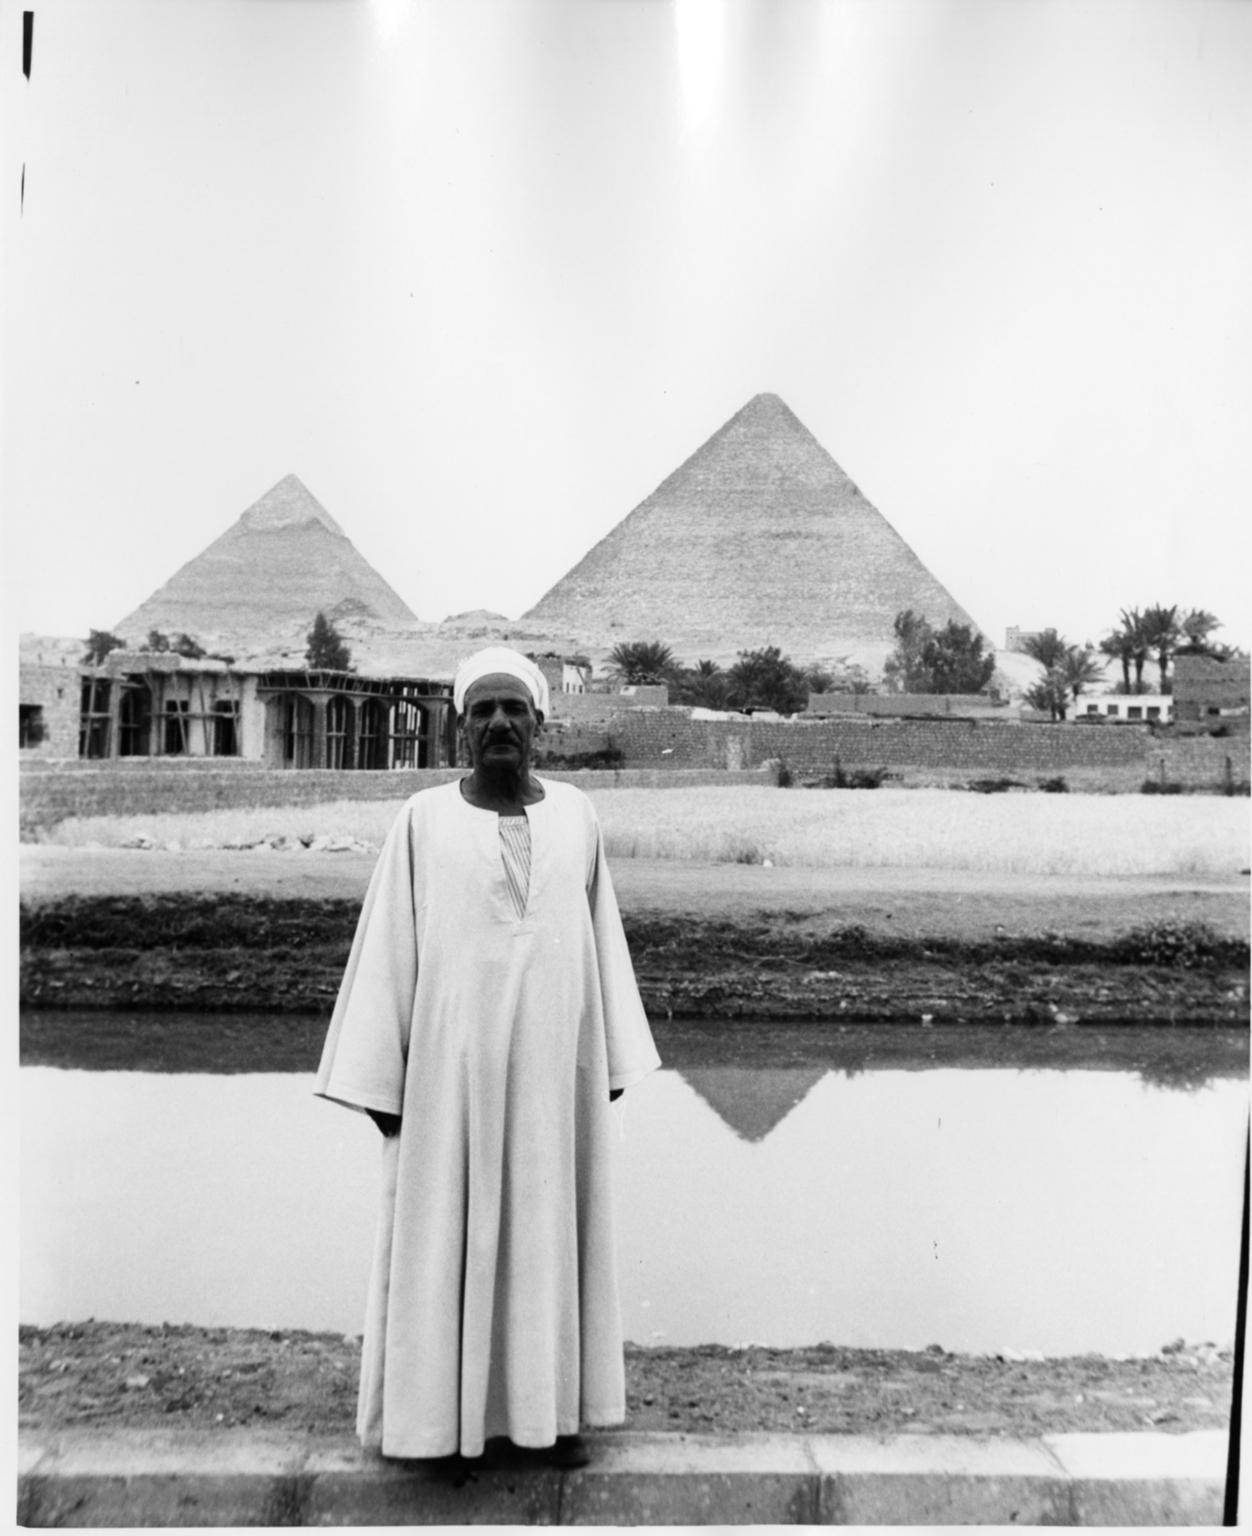 Man in Egypt